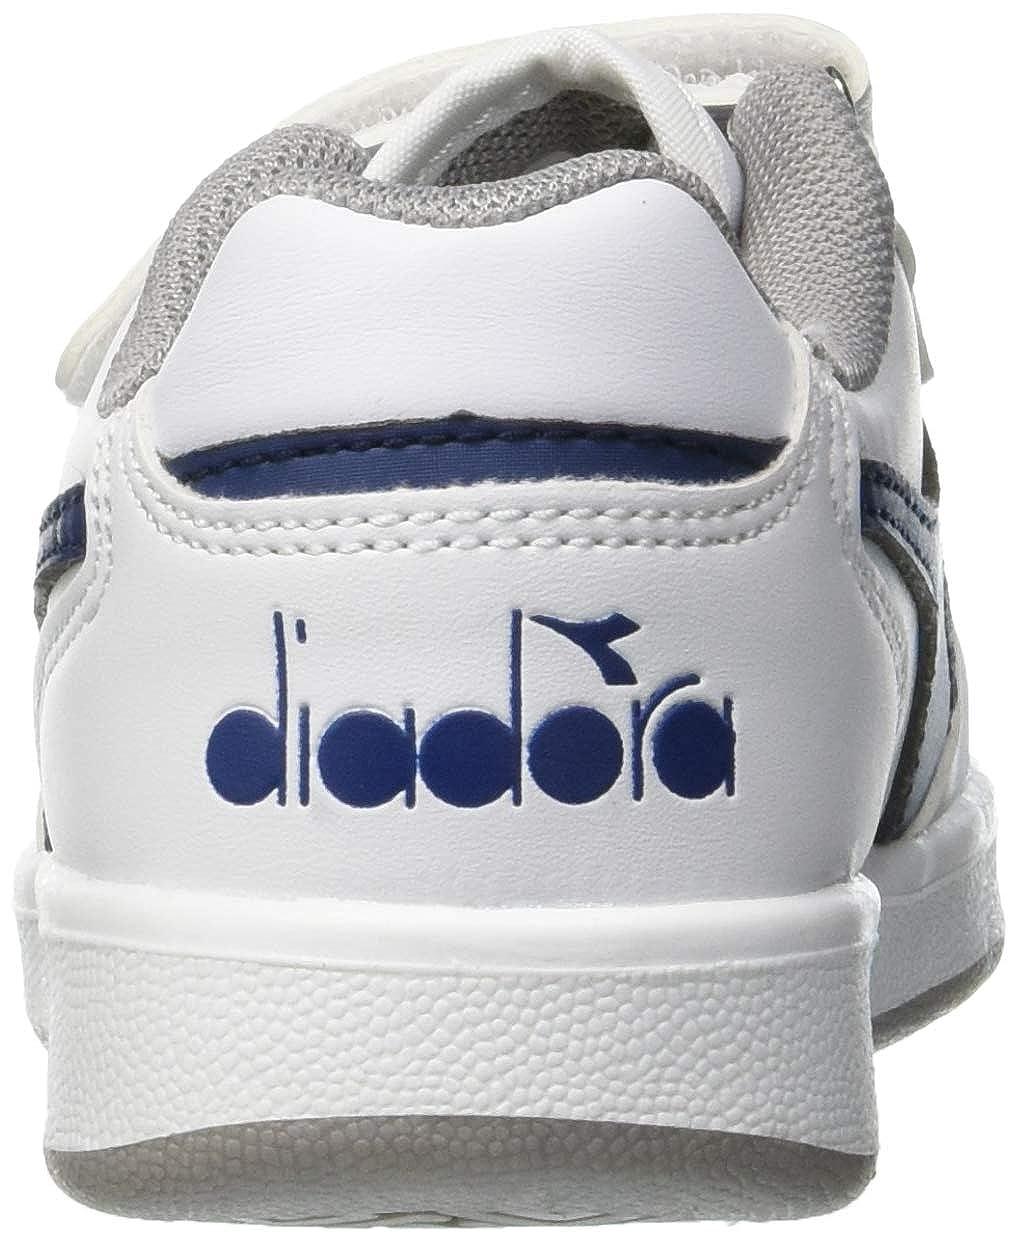 Diadora Unisex-Kinder Playground Ps Gymnastikschuhe